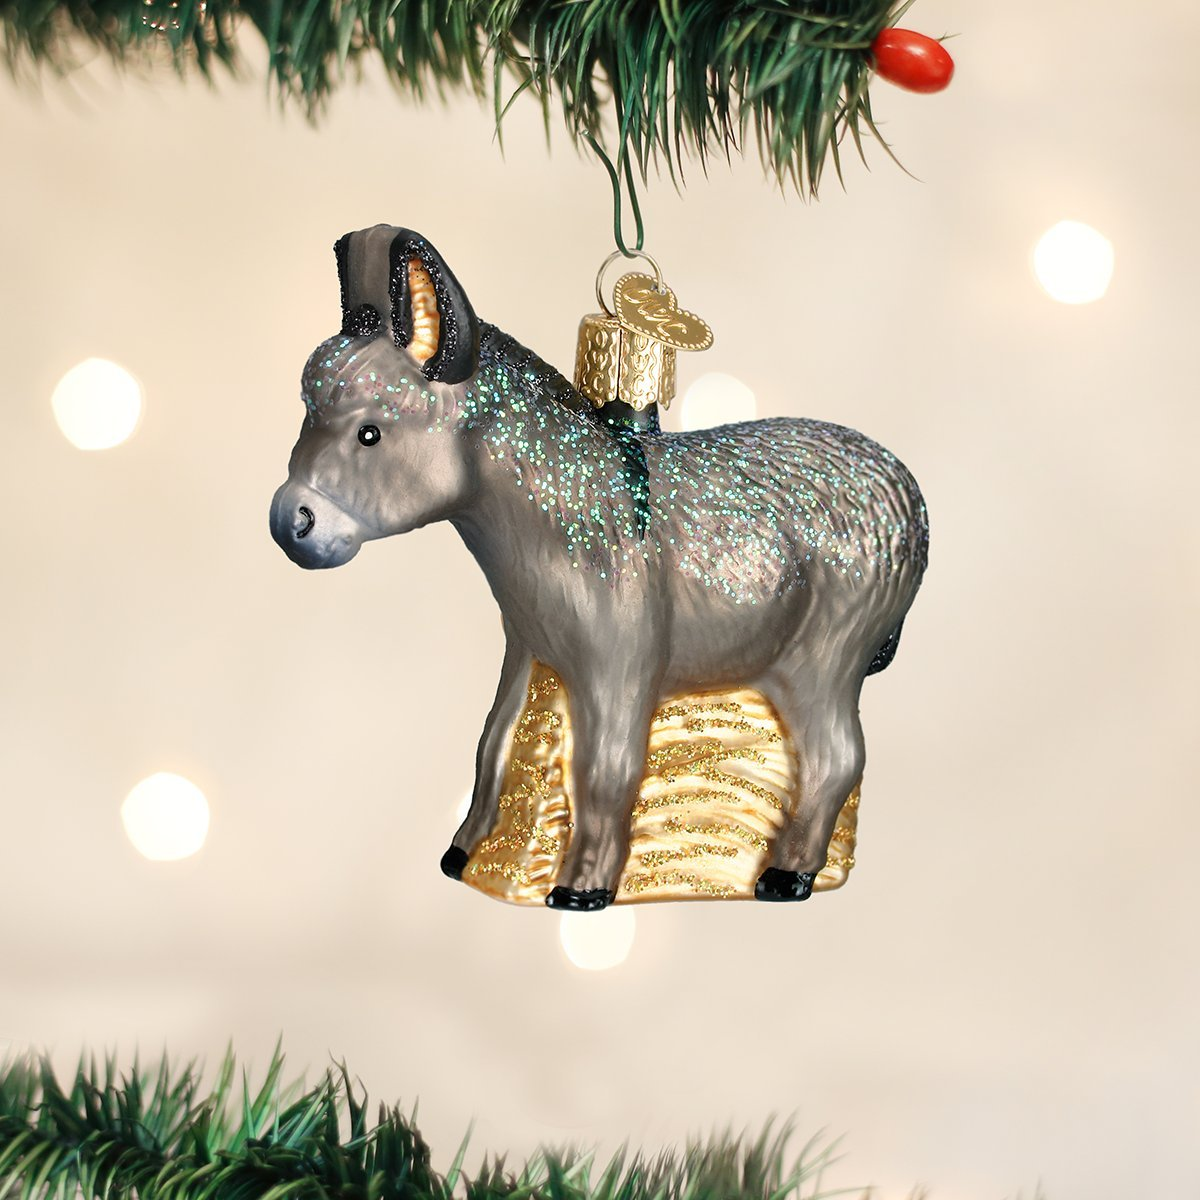 Donkey ornaments - Amazon Com Old World Christmas Donkey Glass Blown Ornament Home Kitchen